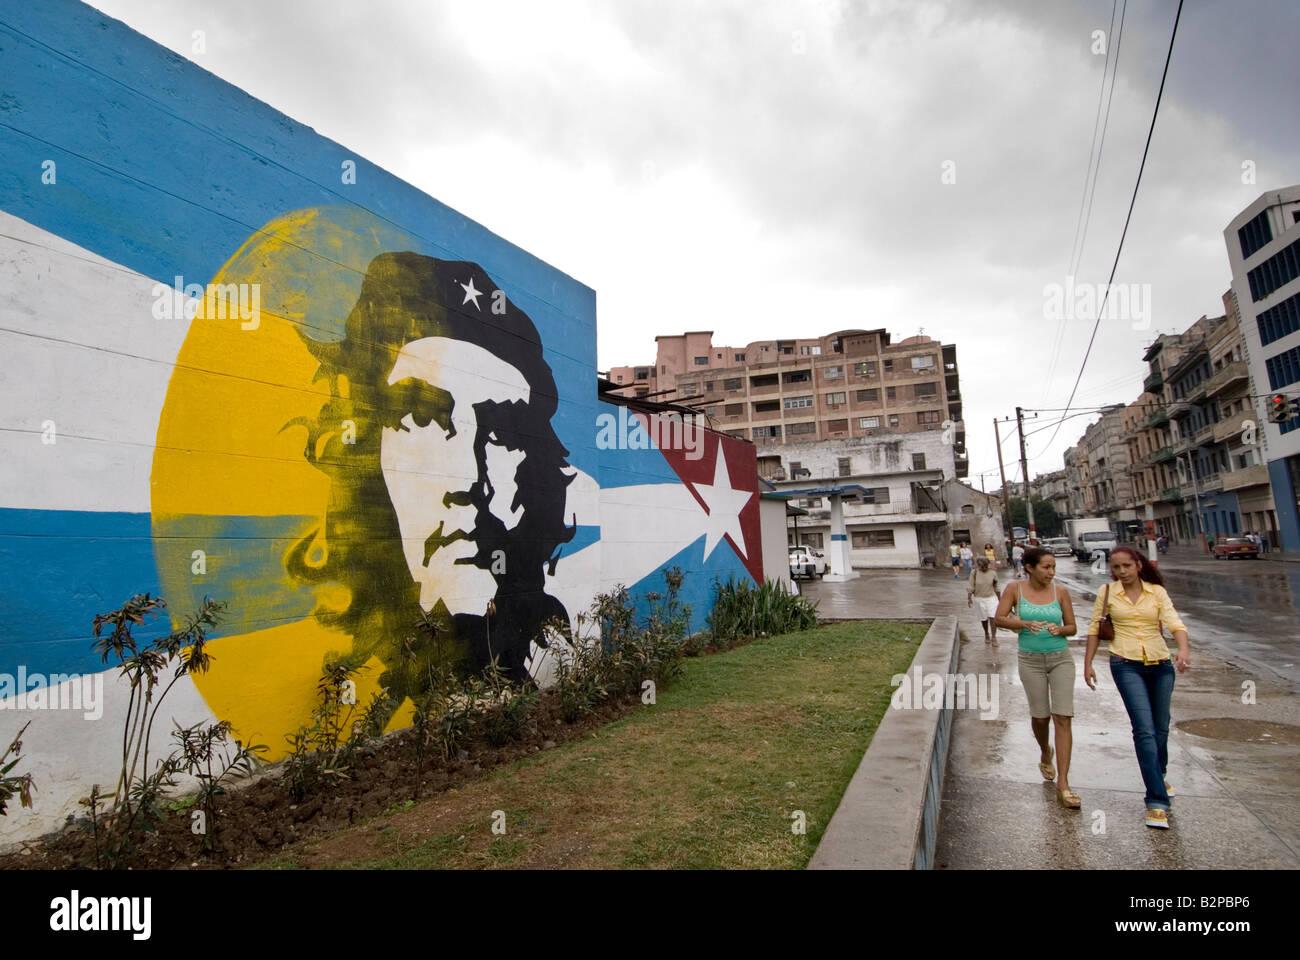 Cuban women walking past Ernesto Che Guevara mural. Centro. Havana. Cuba - Stock Image